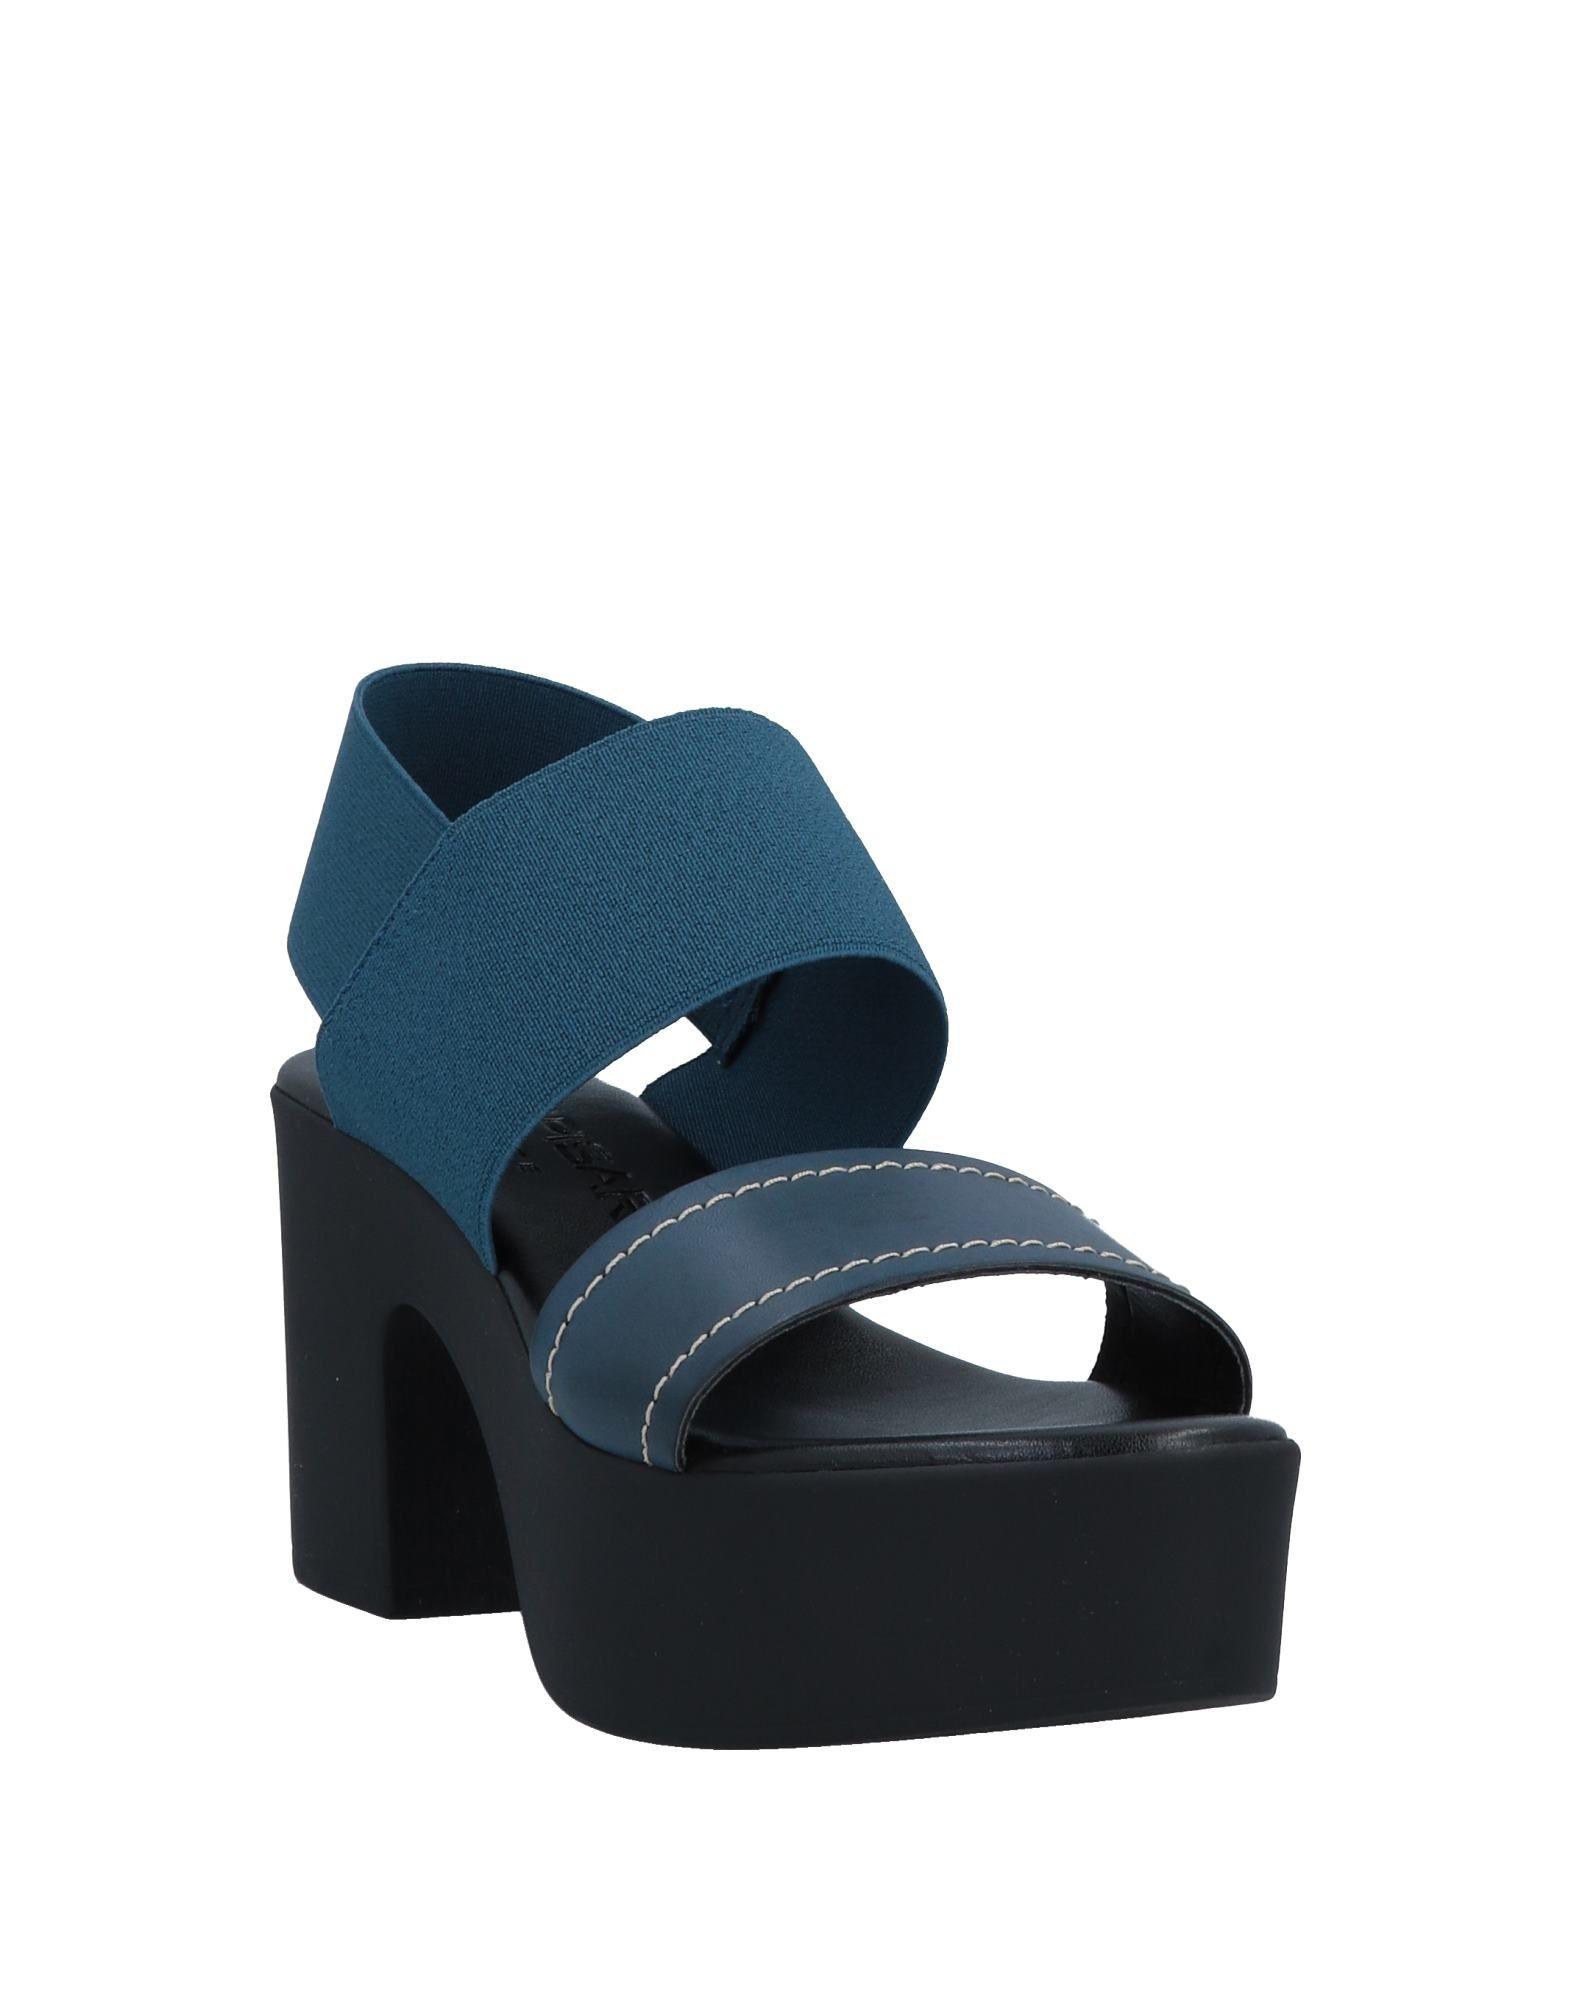 Nr Rapisardi beliebte Sandalen Damen  11631476AB Gute Qualität beliebte Rapisardi Schuhe 9376d5